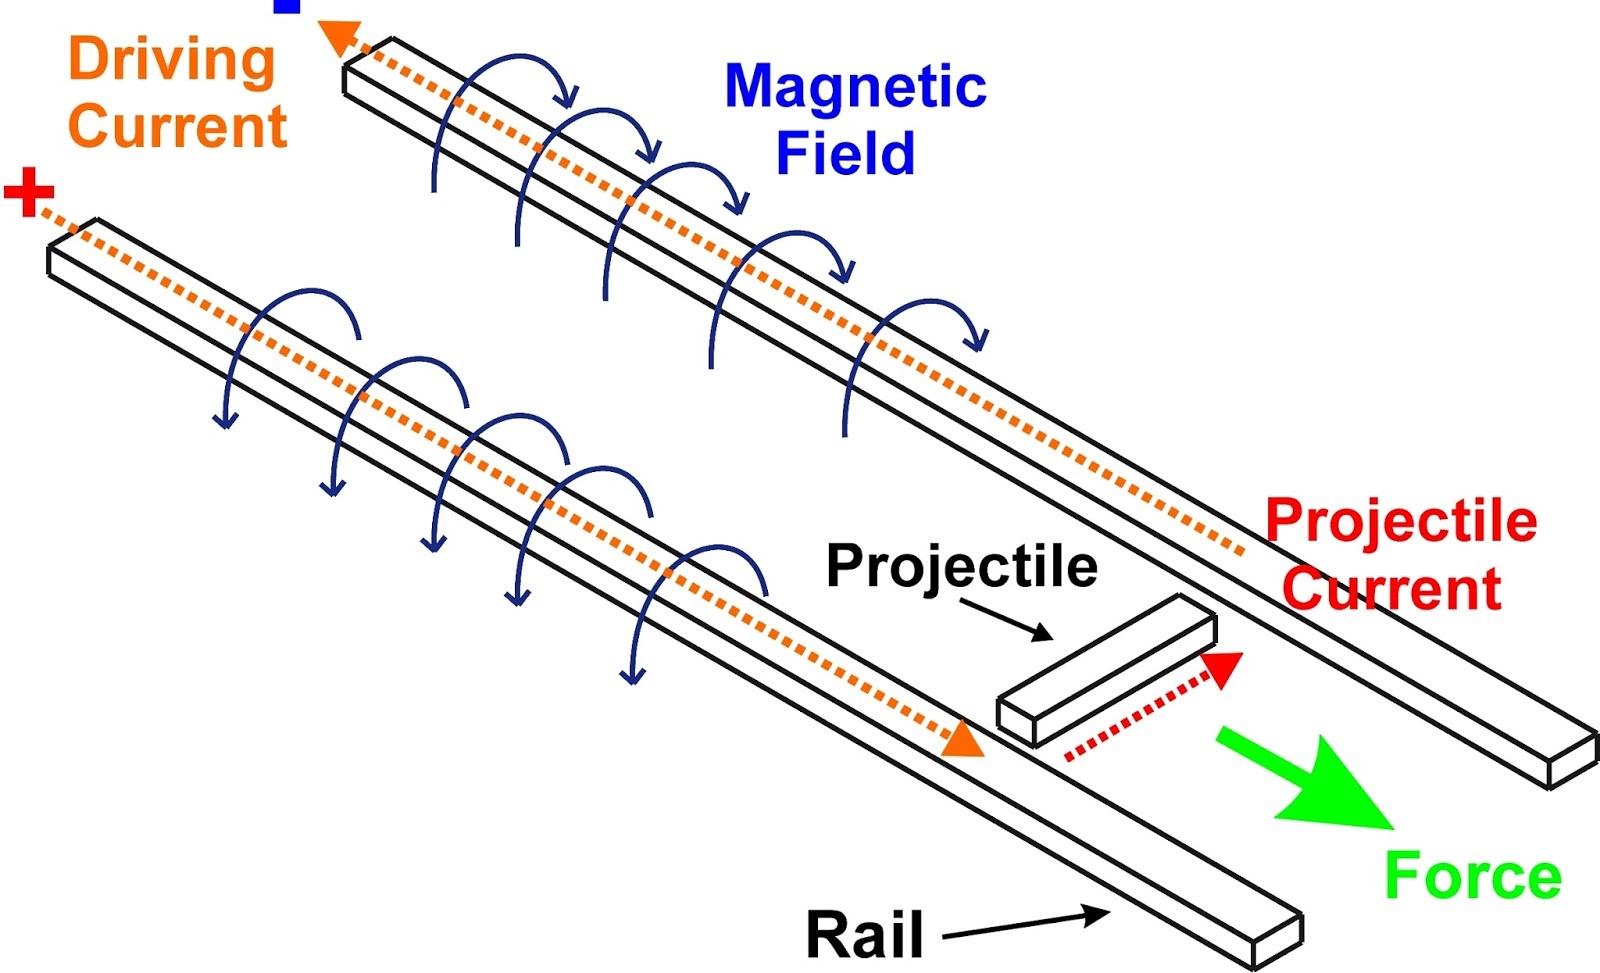 basic gun diagram kenwood kdc mp142 wiring railgun barnard and runge  physics 114 w andl